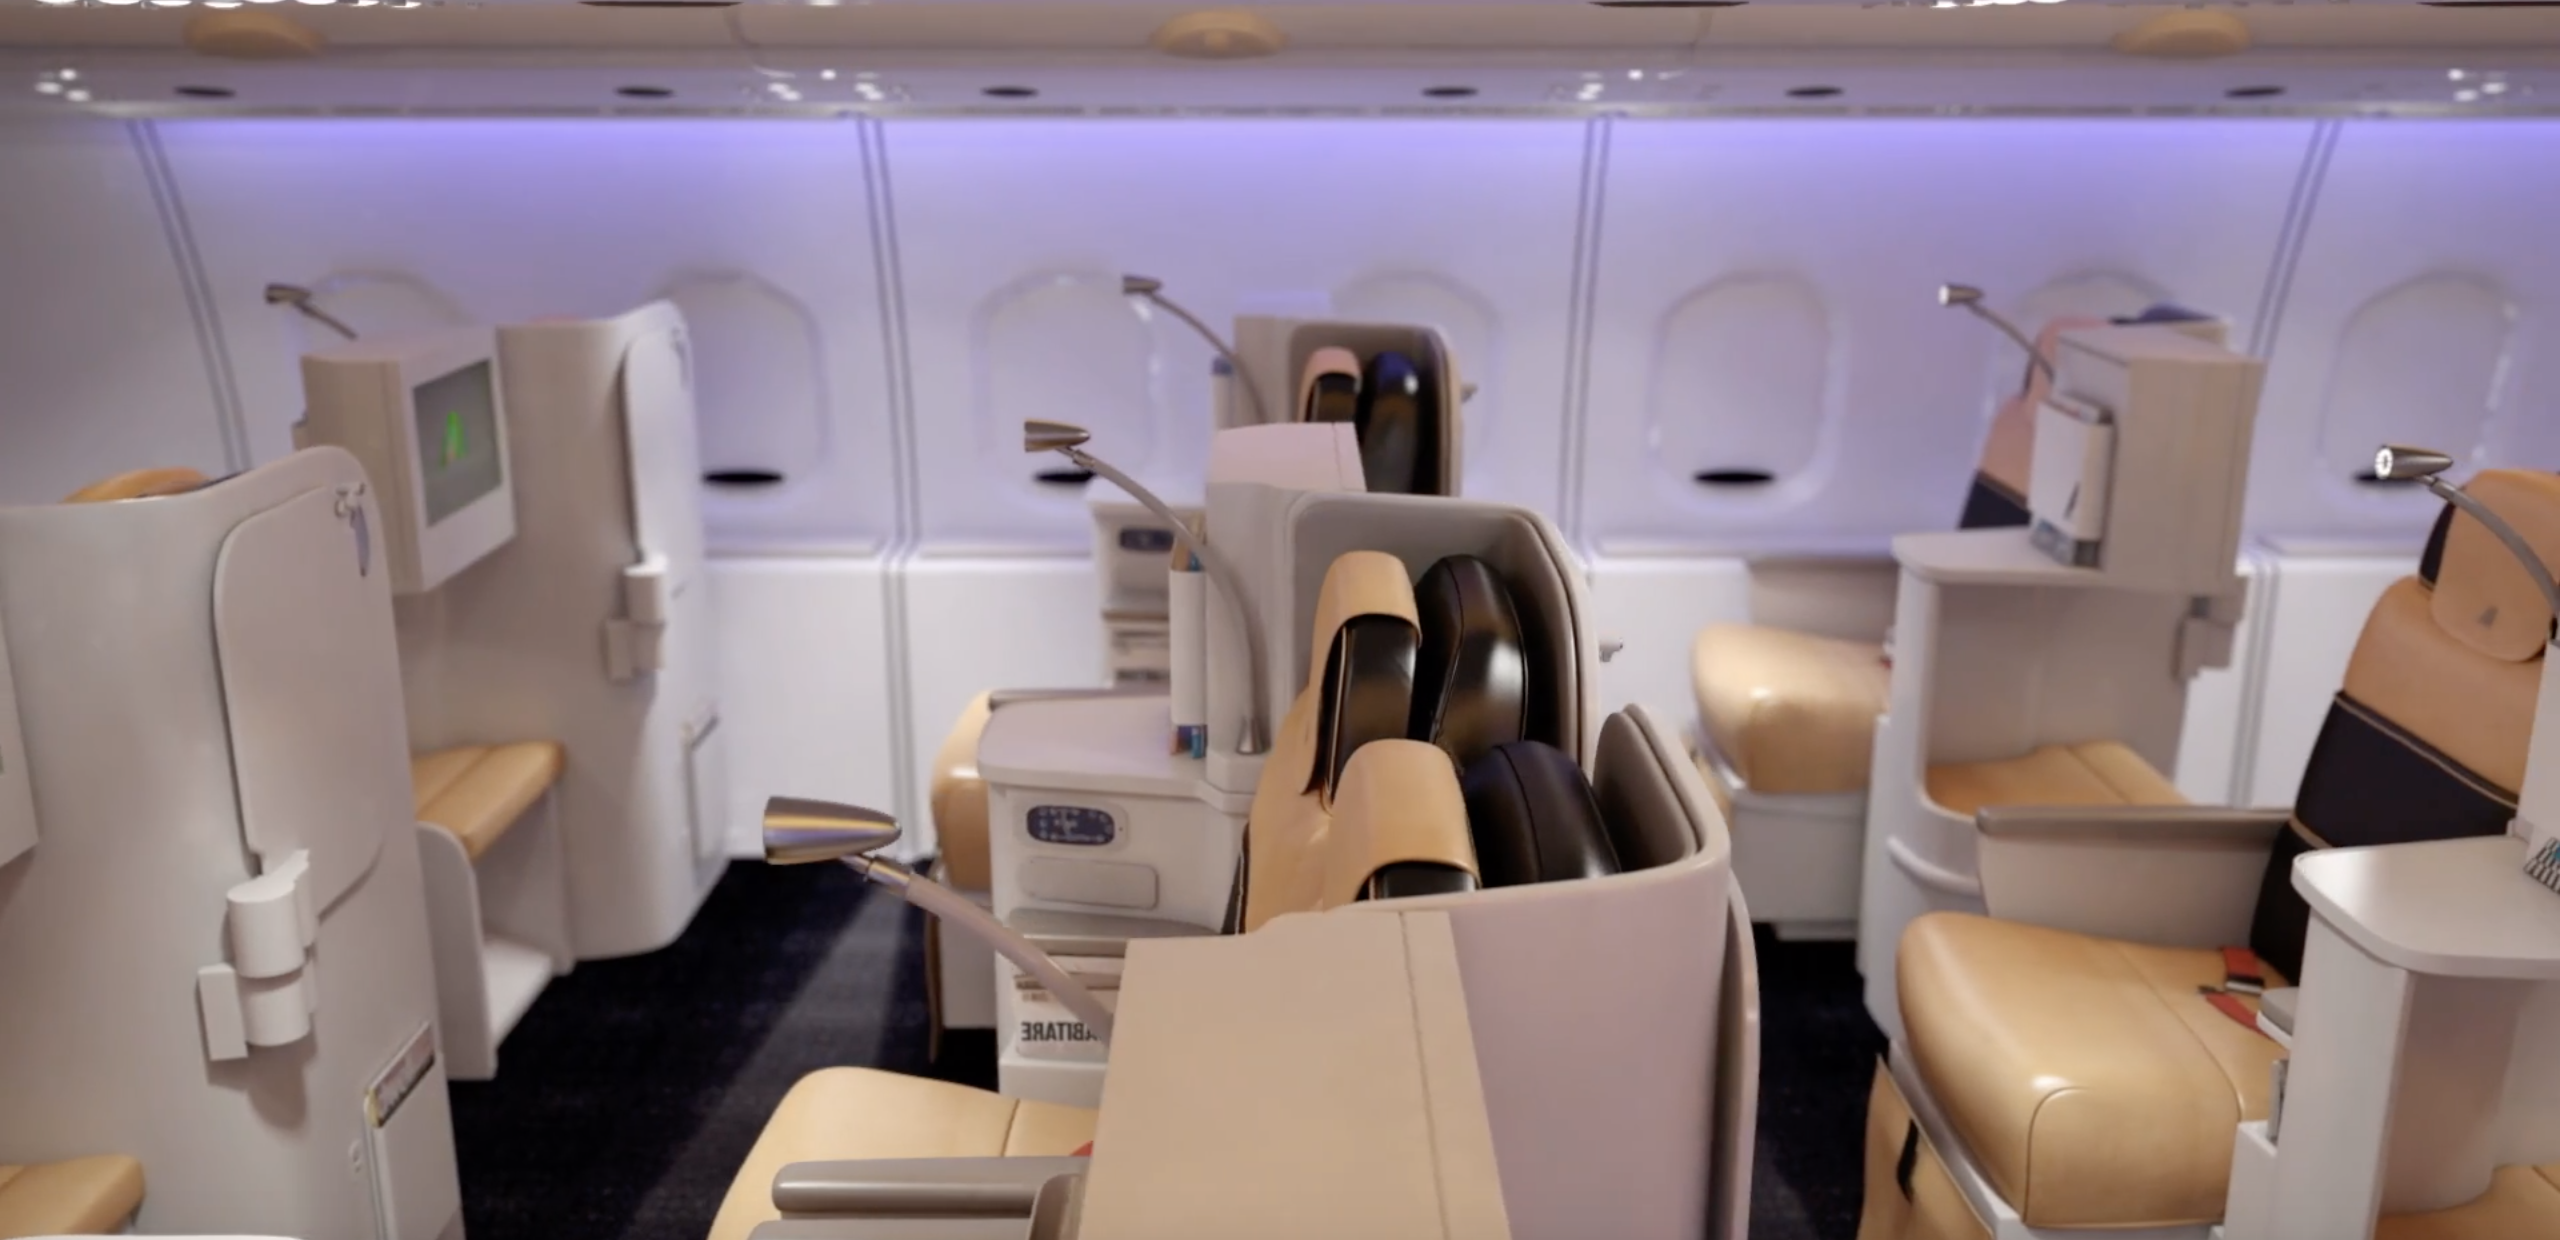 Enjoyable Alitalias Direct Routes From The U S Plane Types Seat Machost Co Dining Chair Design Ideas Machostcouk